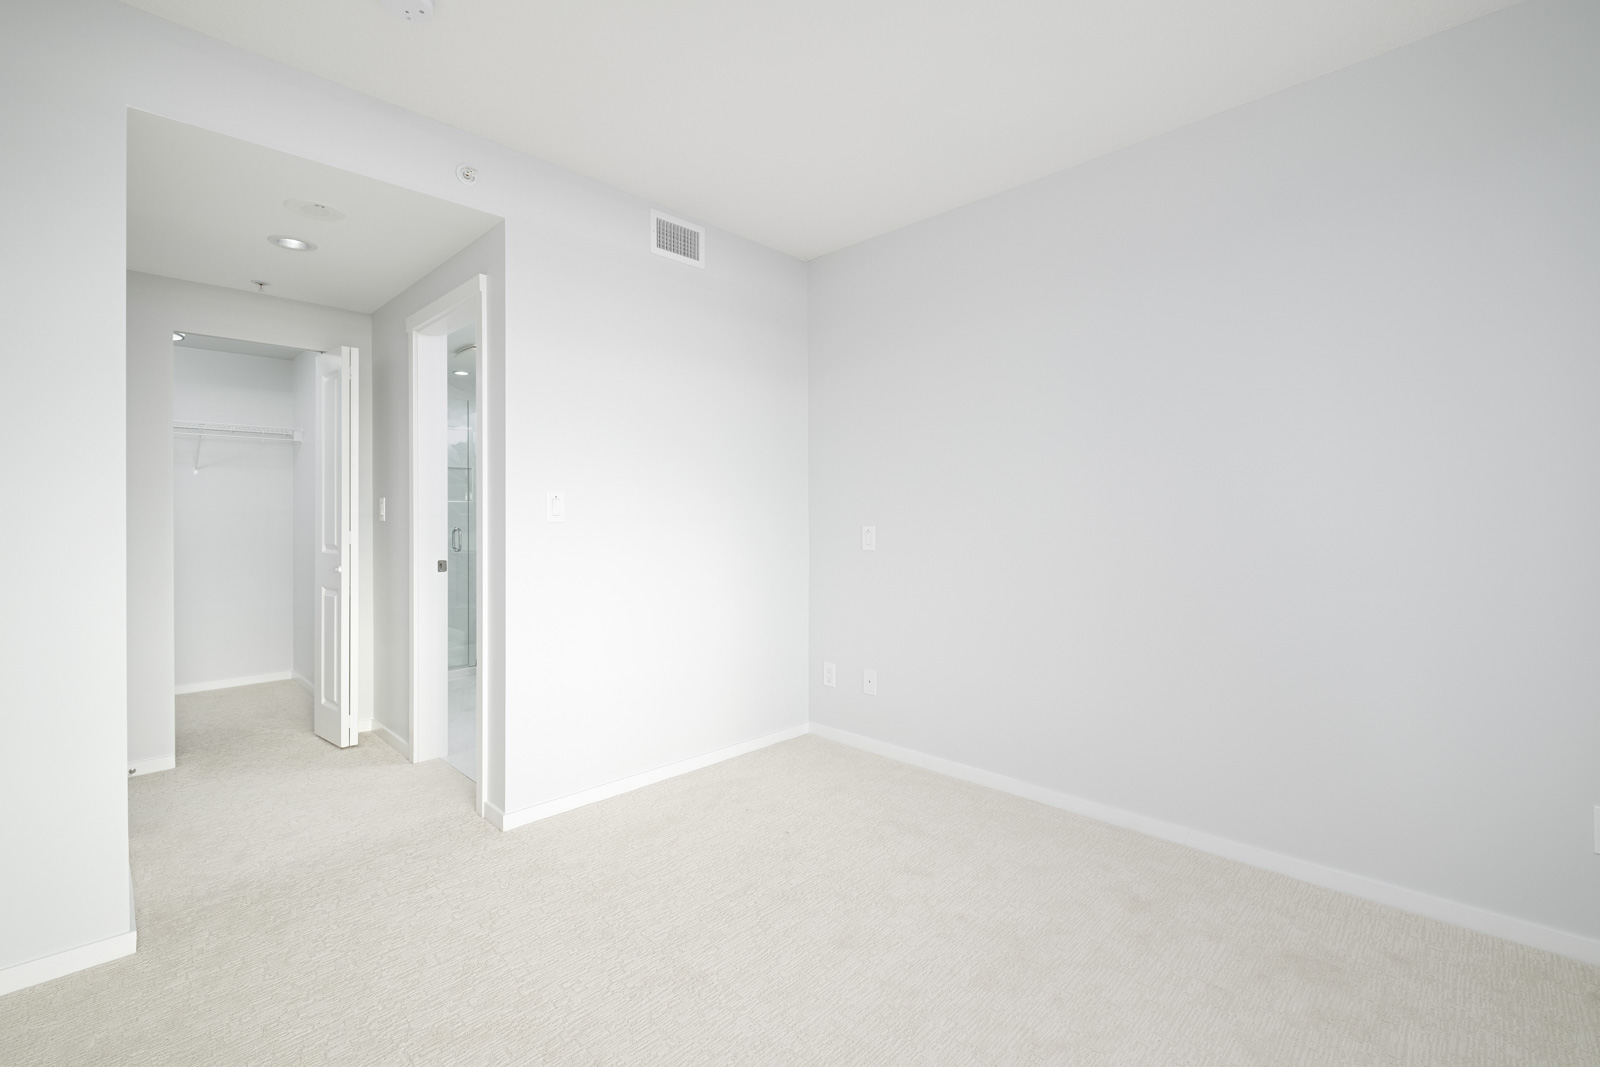 bedroom with white walls and hardwood floors in rental condo in the Metrotown neighbourhood of Burnaby